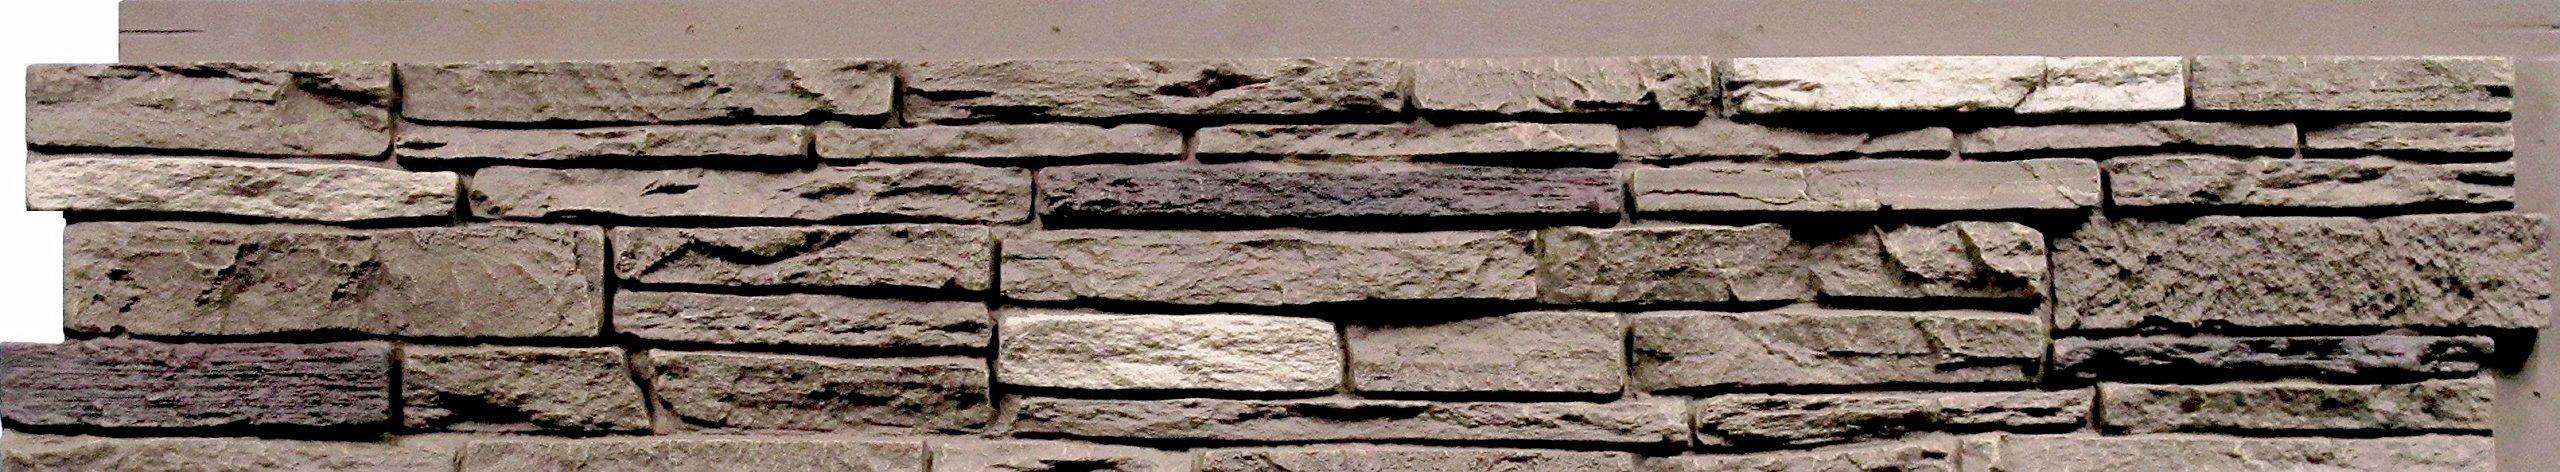 NextStone Slatestone Panel Brunswick Brown (8 Panels Per Box)(17.12 Sq. Ft. Per Box)